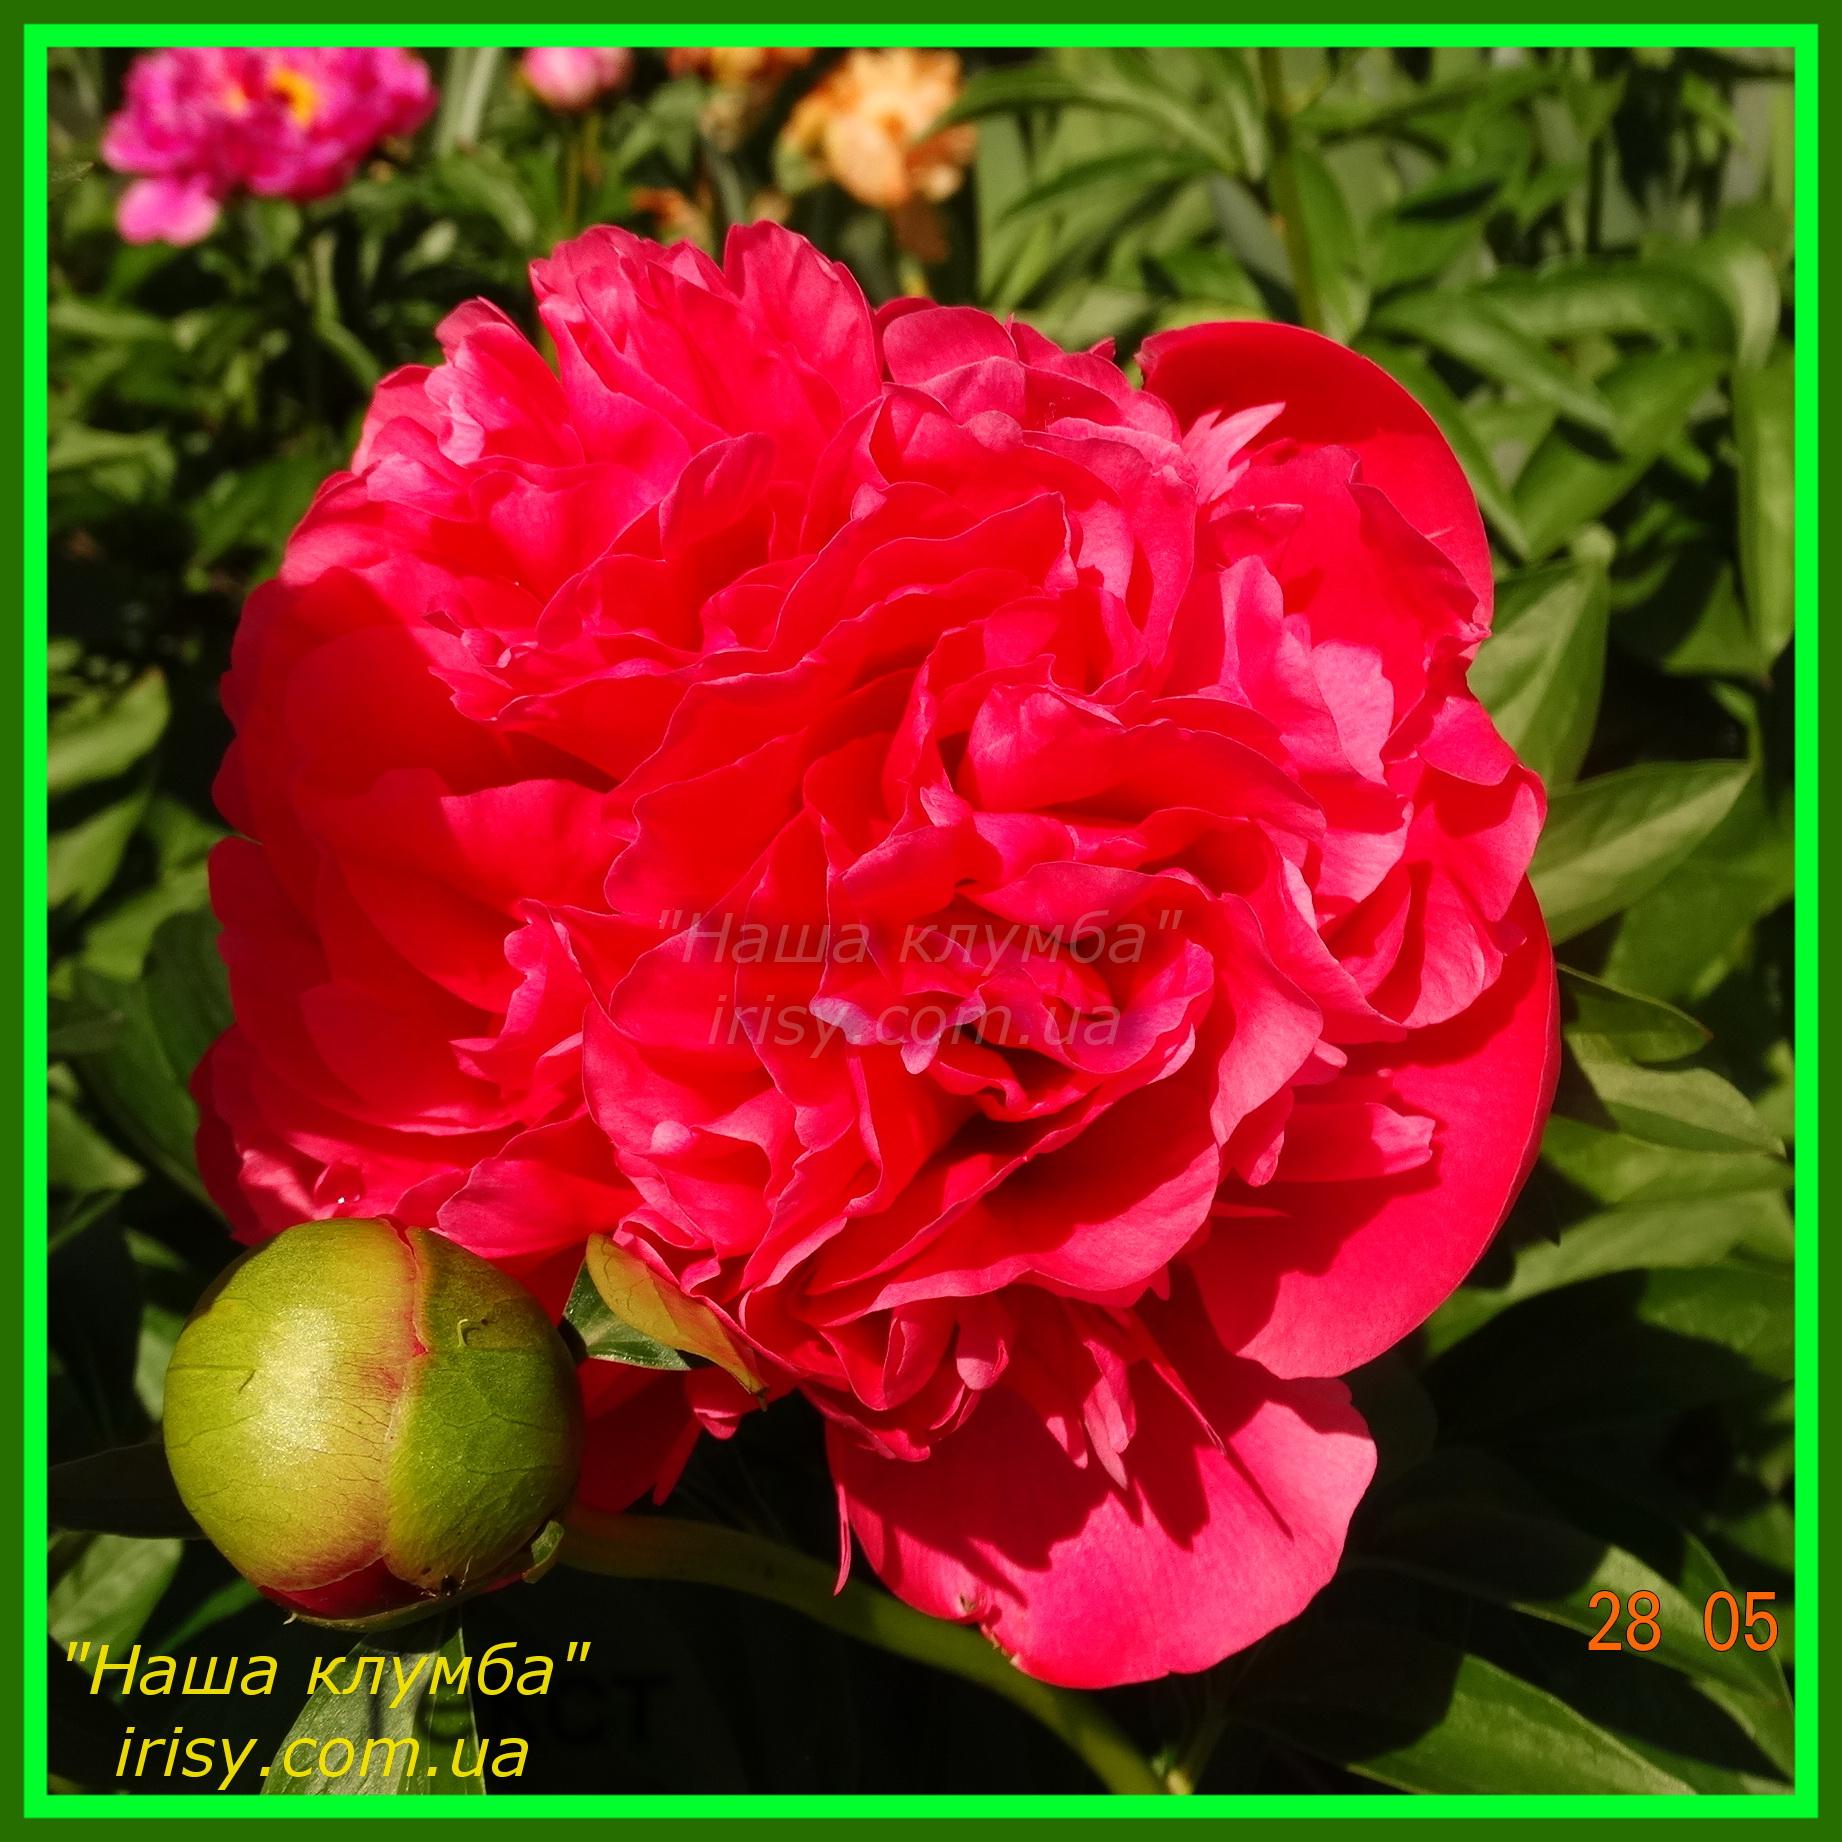 Glowing Raspberry Rose. Cousins Lyman - Klehm Roy G.'1981, Canada-USА.